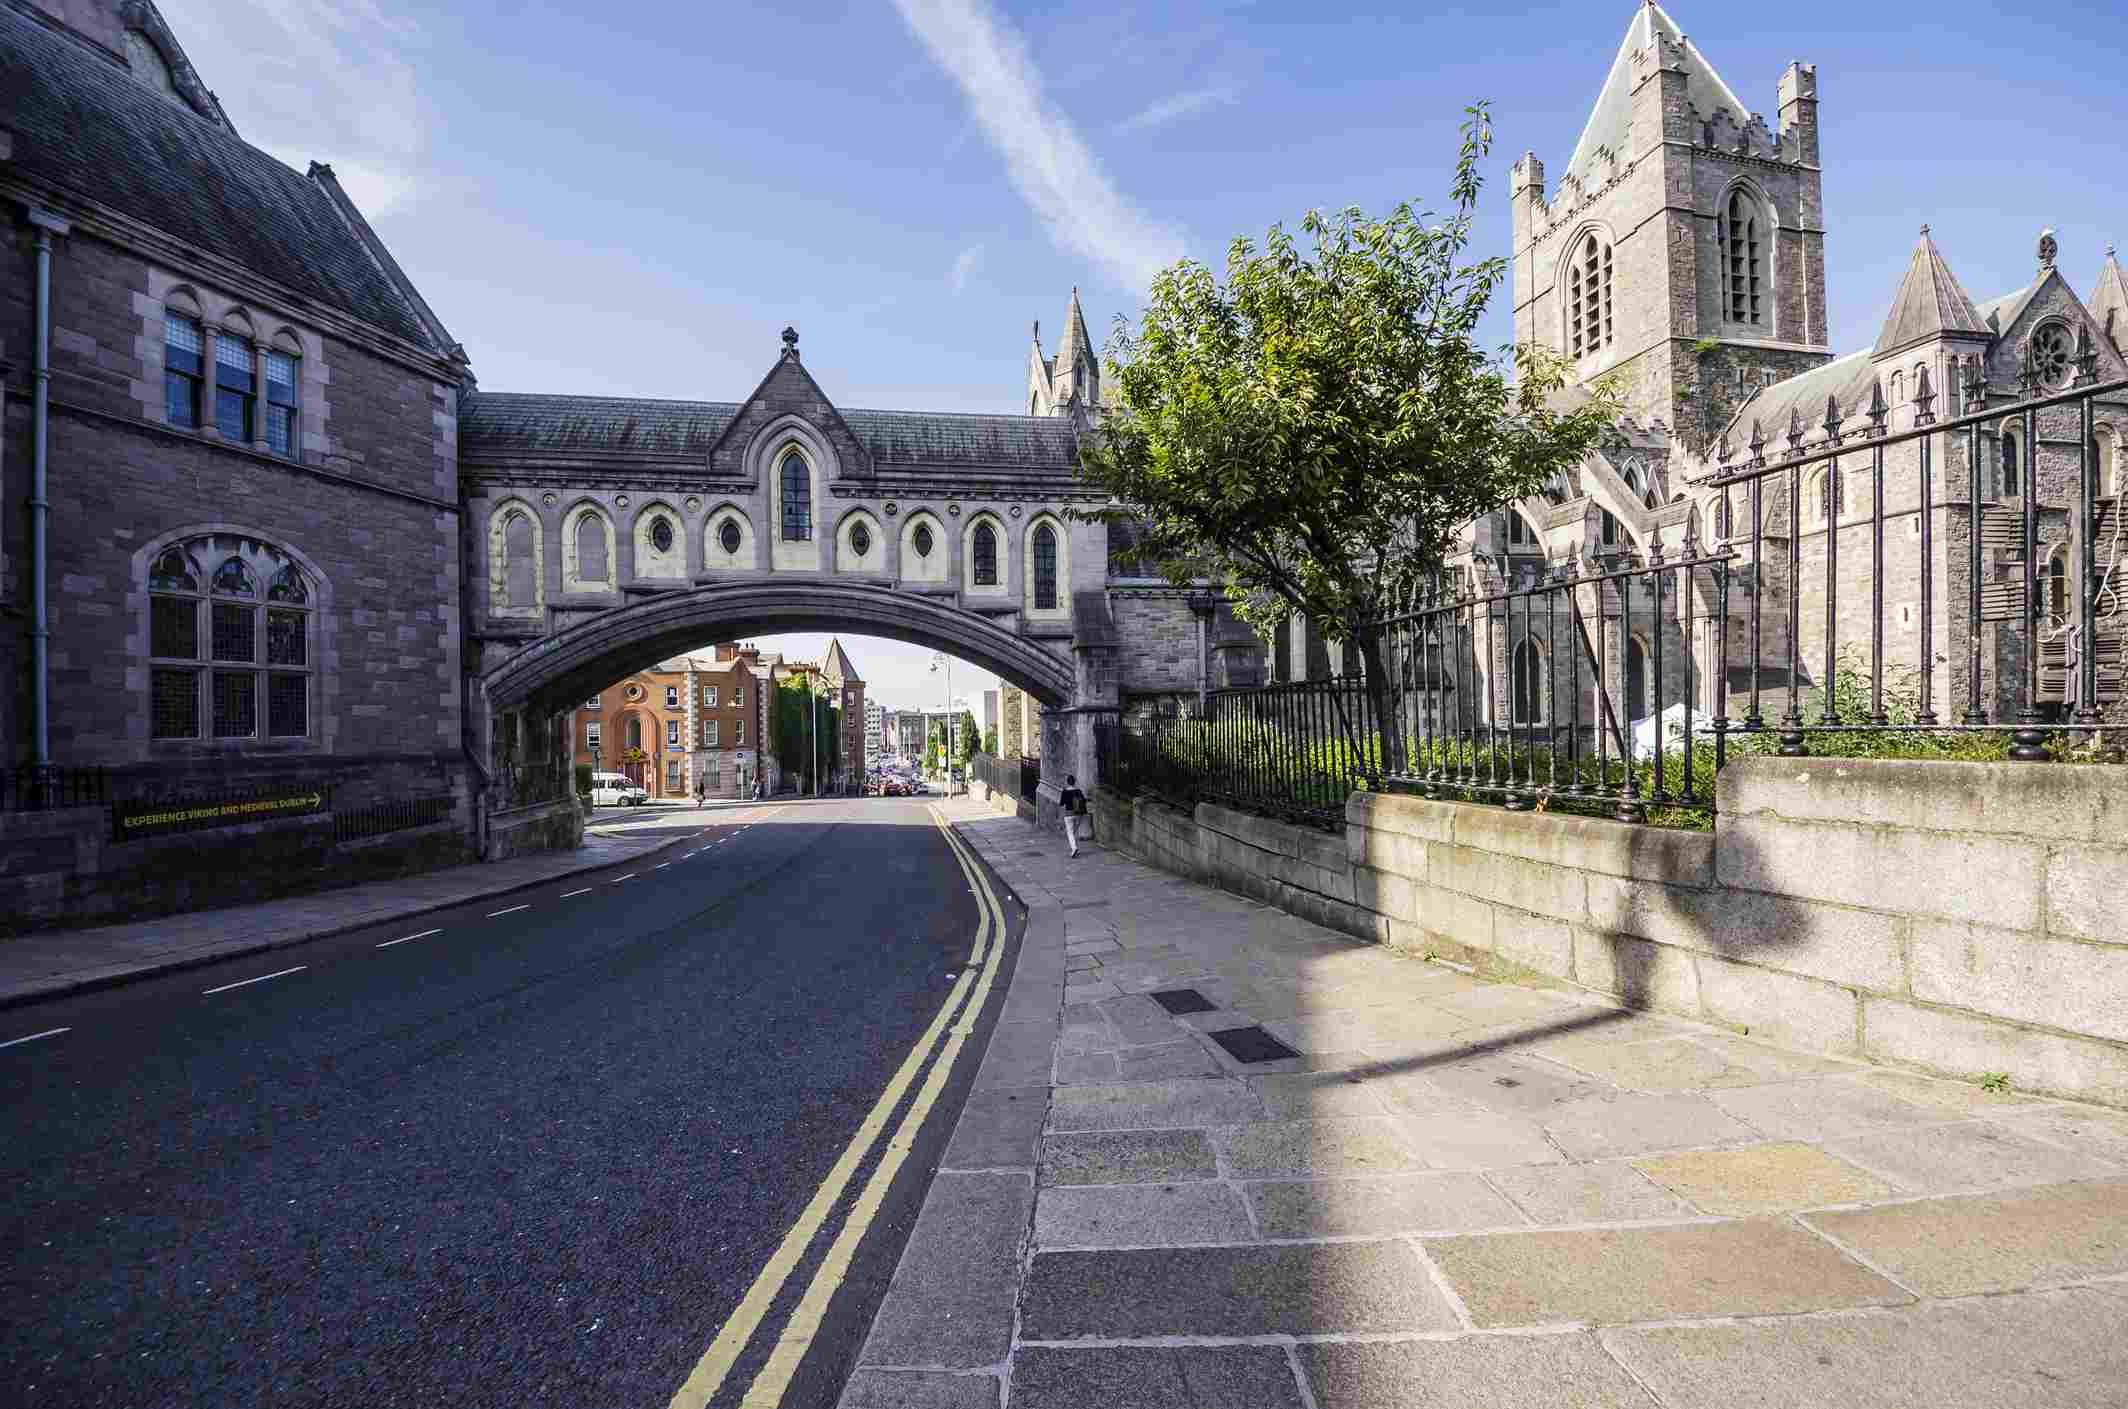 Ireland, County Dublin, Dublin, Dublinia, Wood Quay, Dublinia Museum and Christ Church Cathedral right